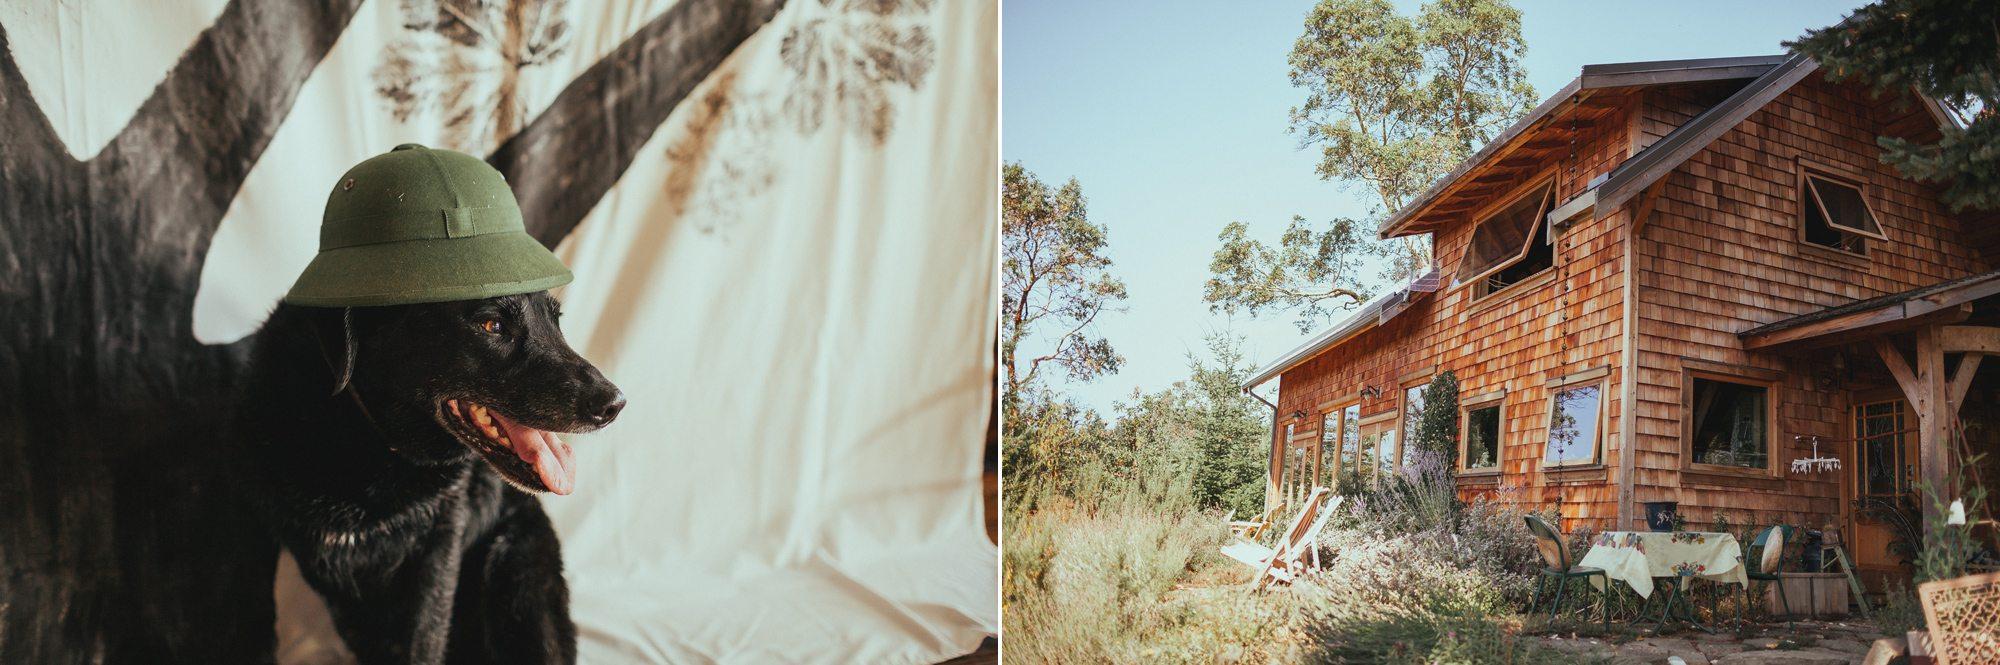 sarah-sal-galiano-wedding-photographer28